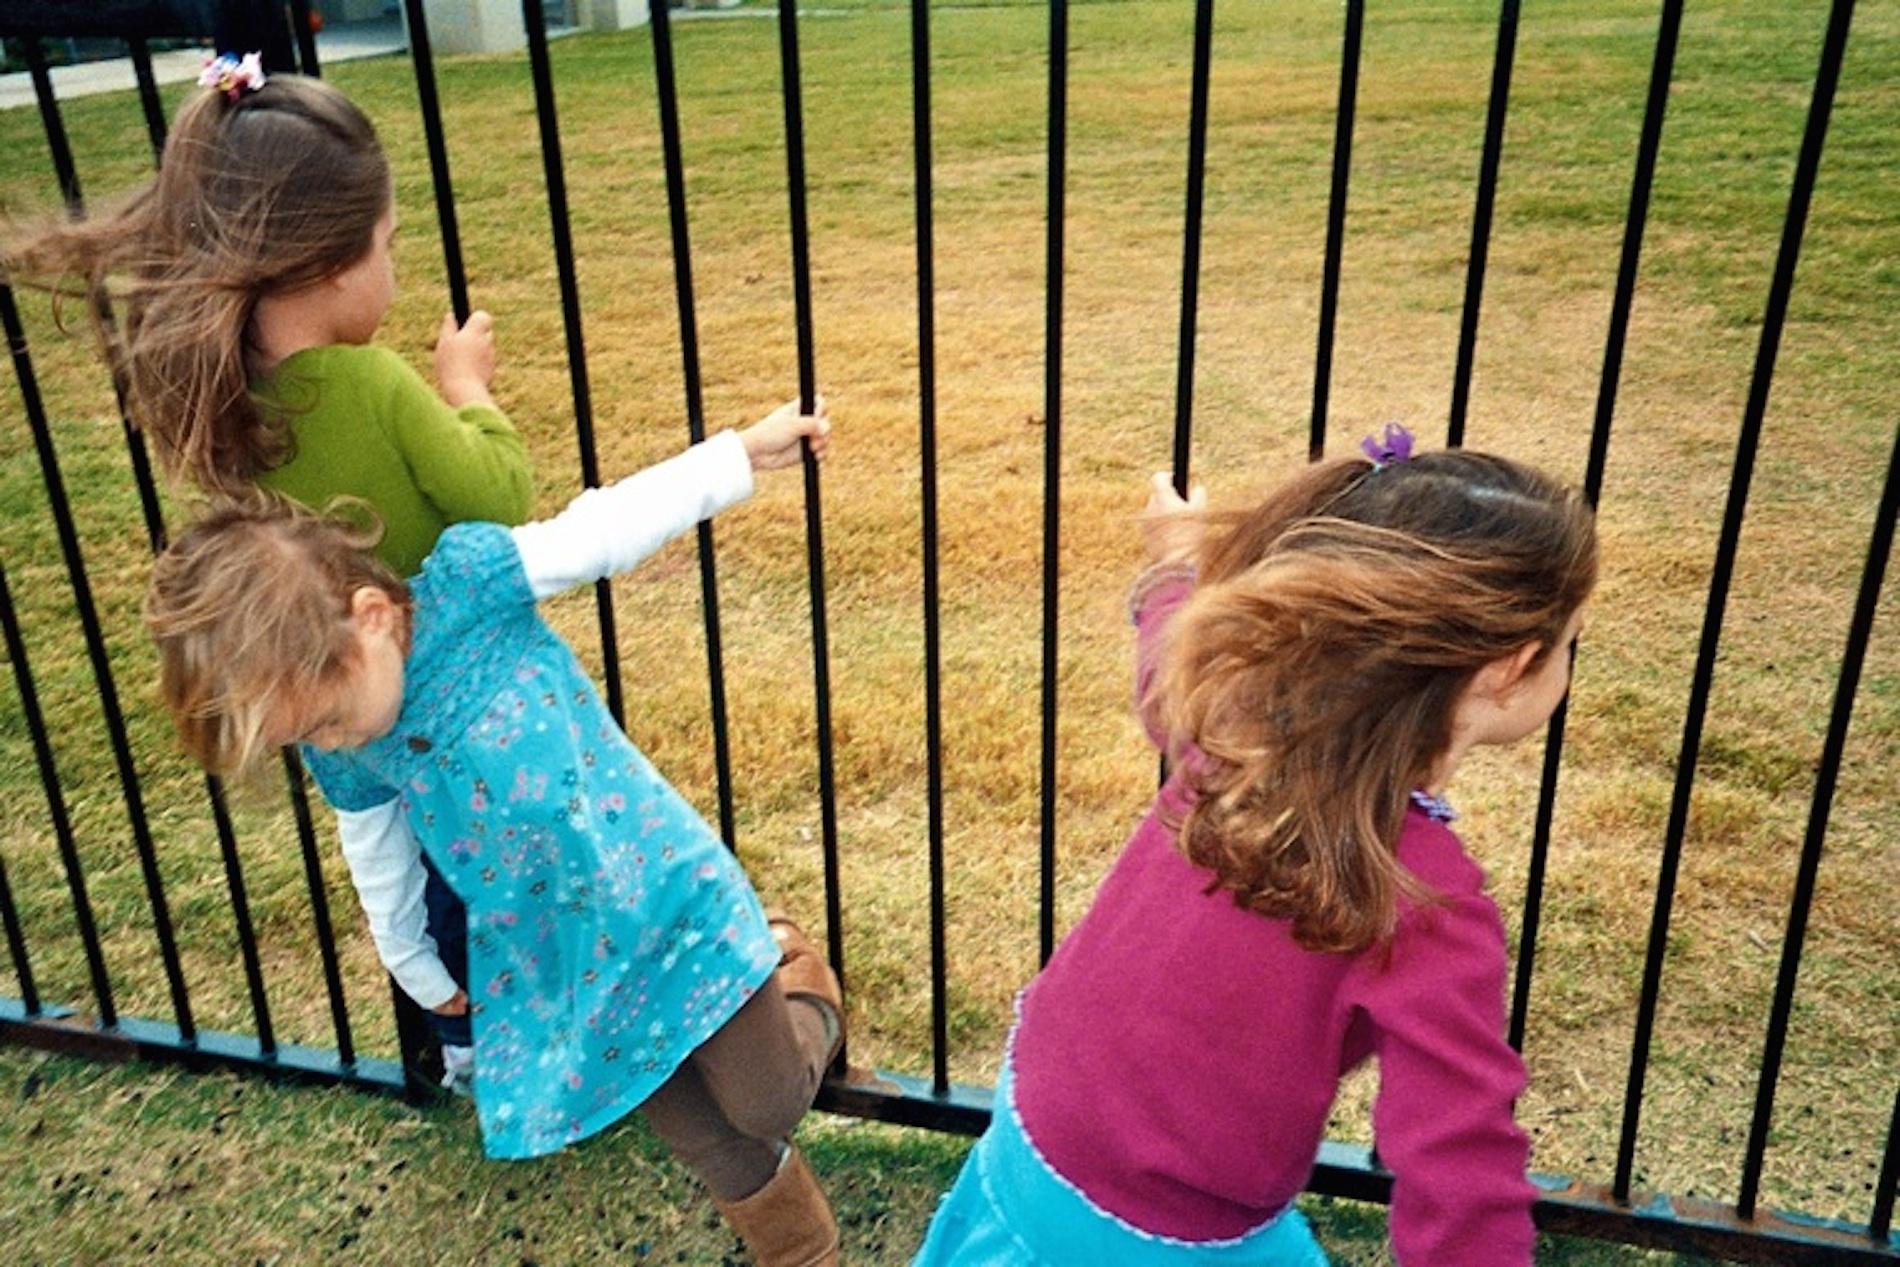 lindsay-dye-photography-art-girls-playground.jpg